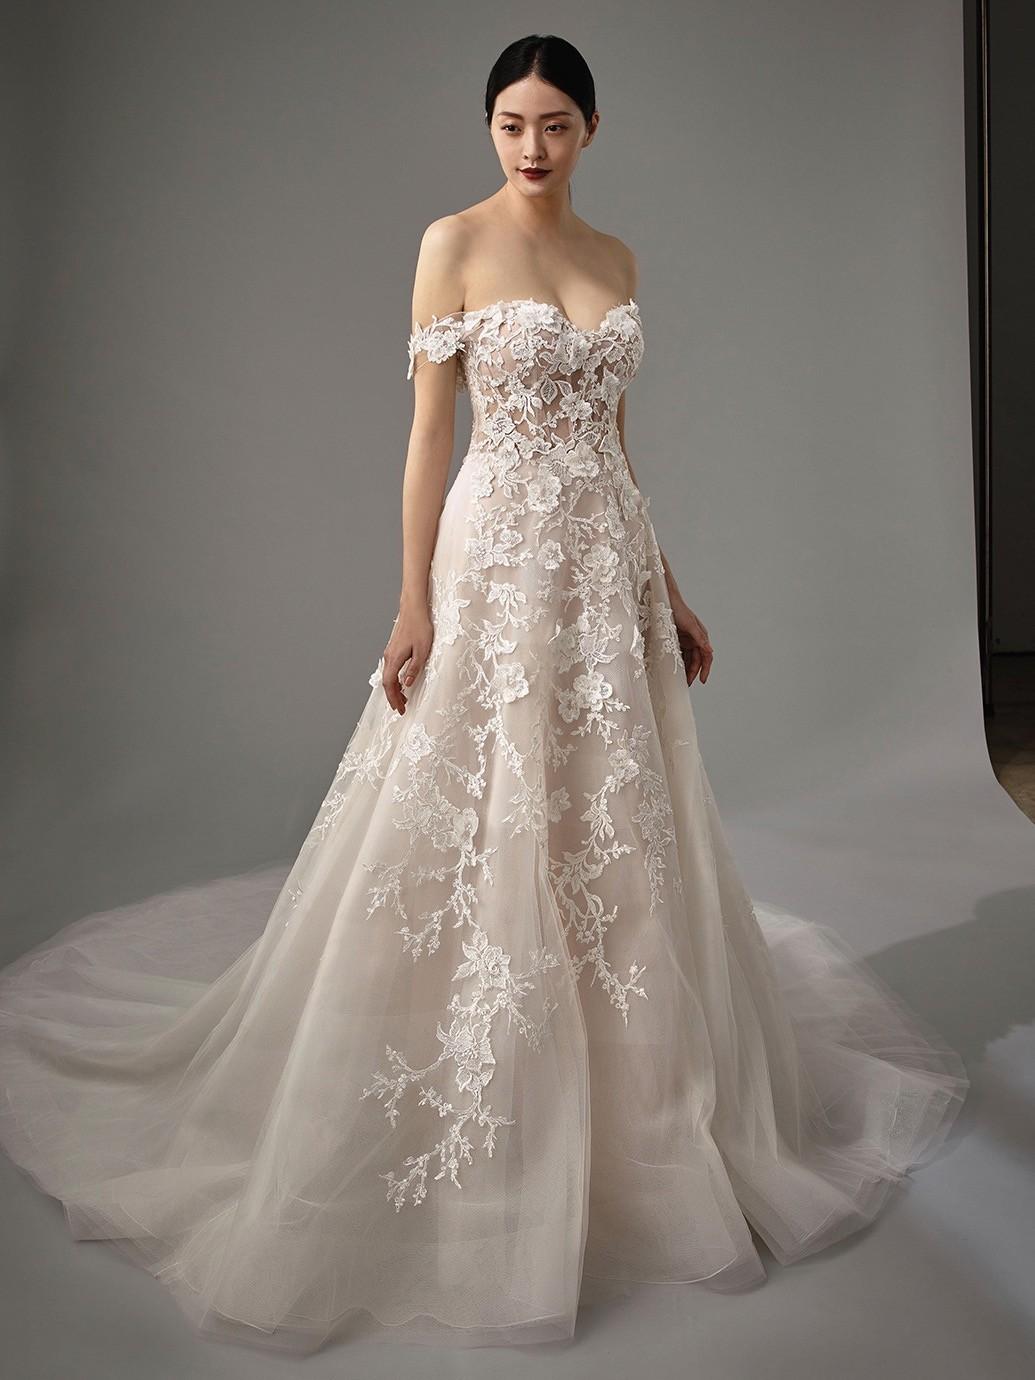 Brautkleid Modell Misti aus der Blue by Enzoani Kollektion 2020